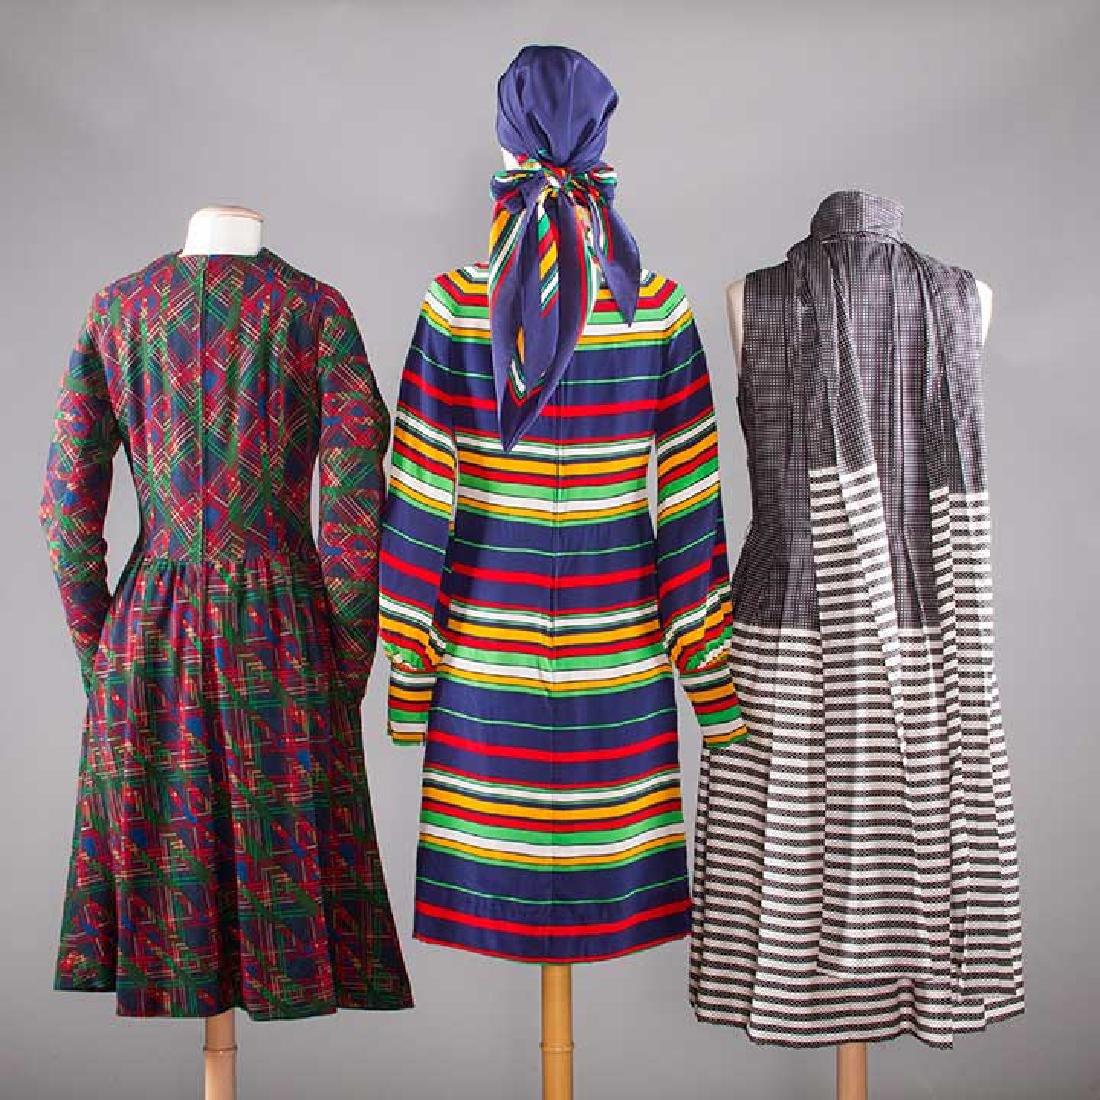 THREE PAULINE TRIGERE DRESSES, 1970s - 3